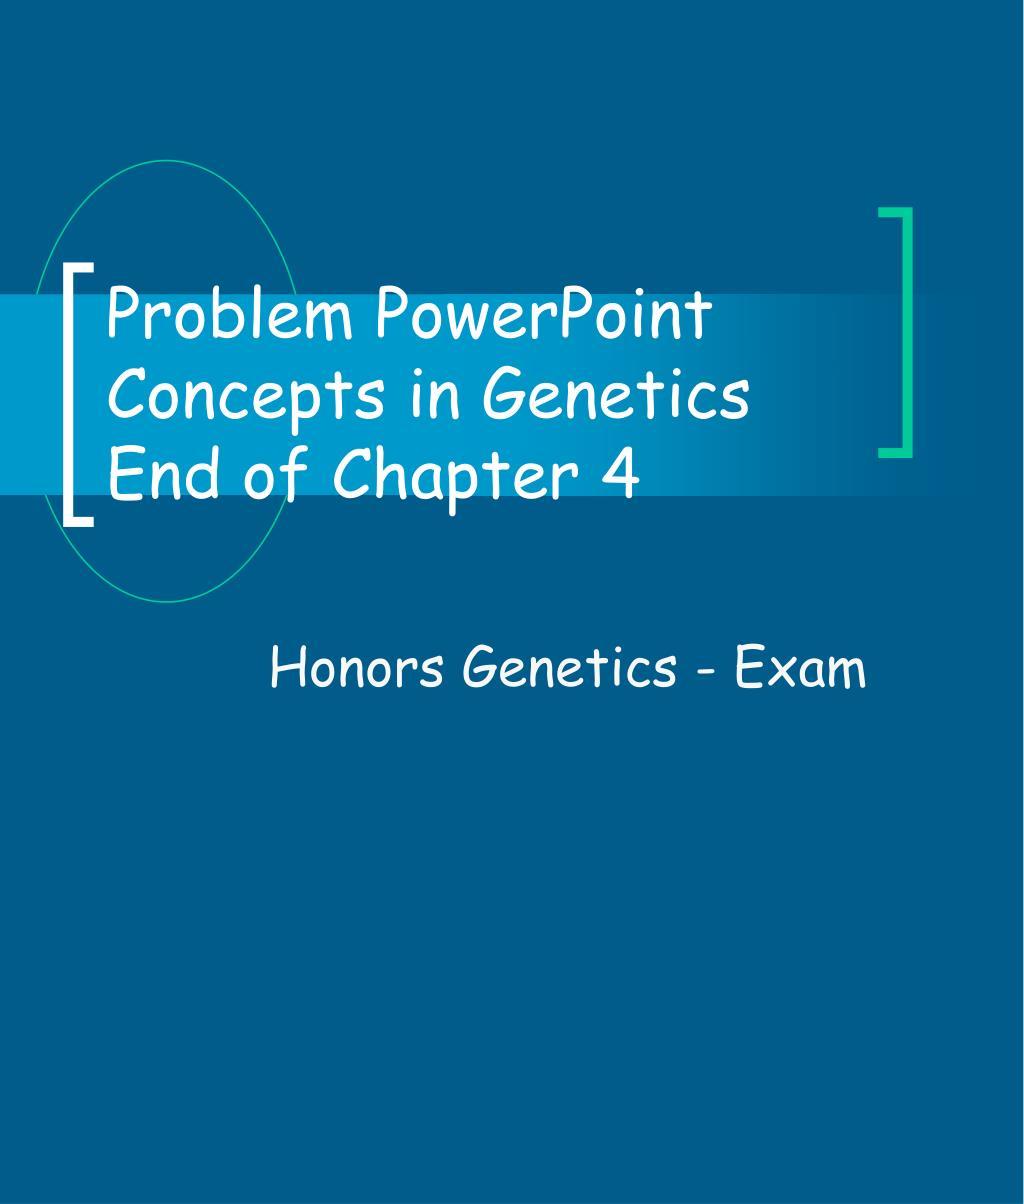 Problem PowerPoint